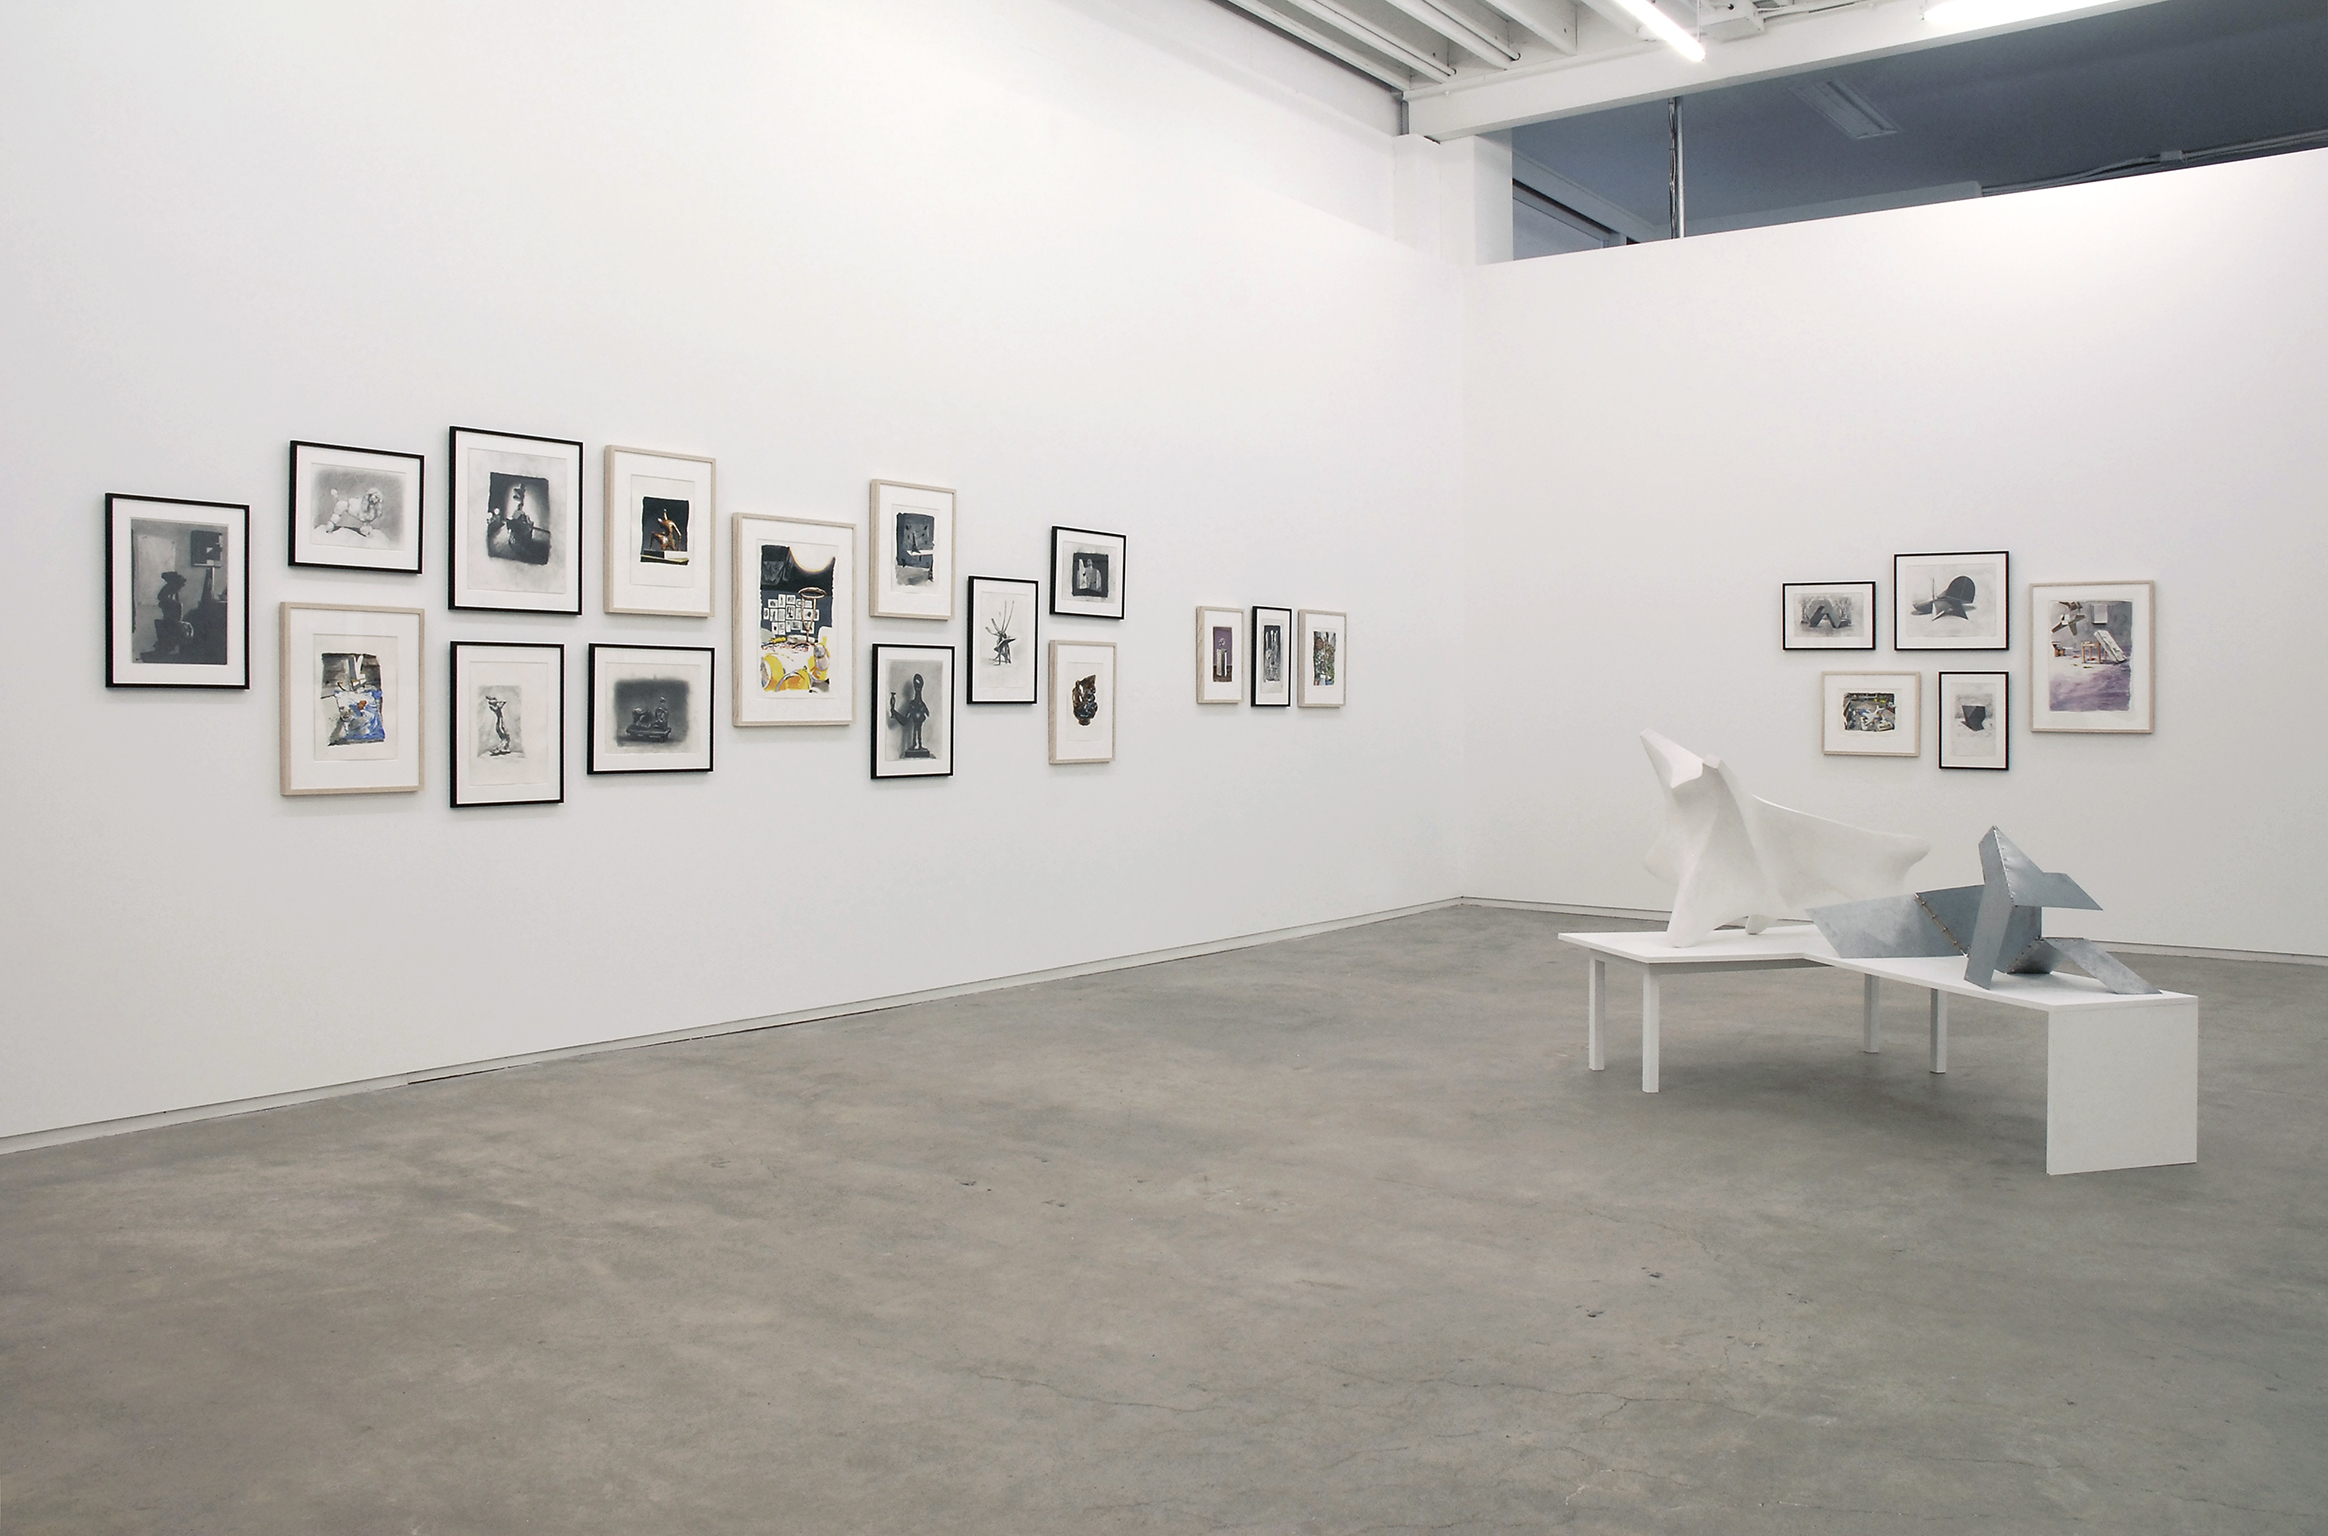 Roy Kiyooka, Damian Moppett, Jerry Pethick, Ian Wallace, installation view, Process as Work, Catriona Jeffries, 2008 by